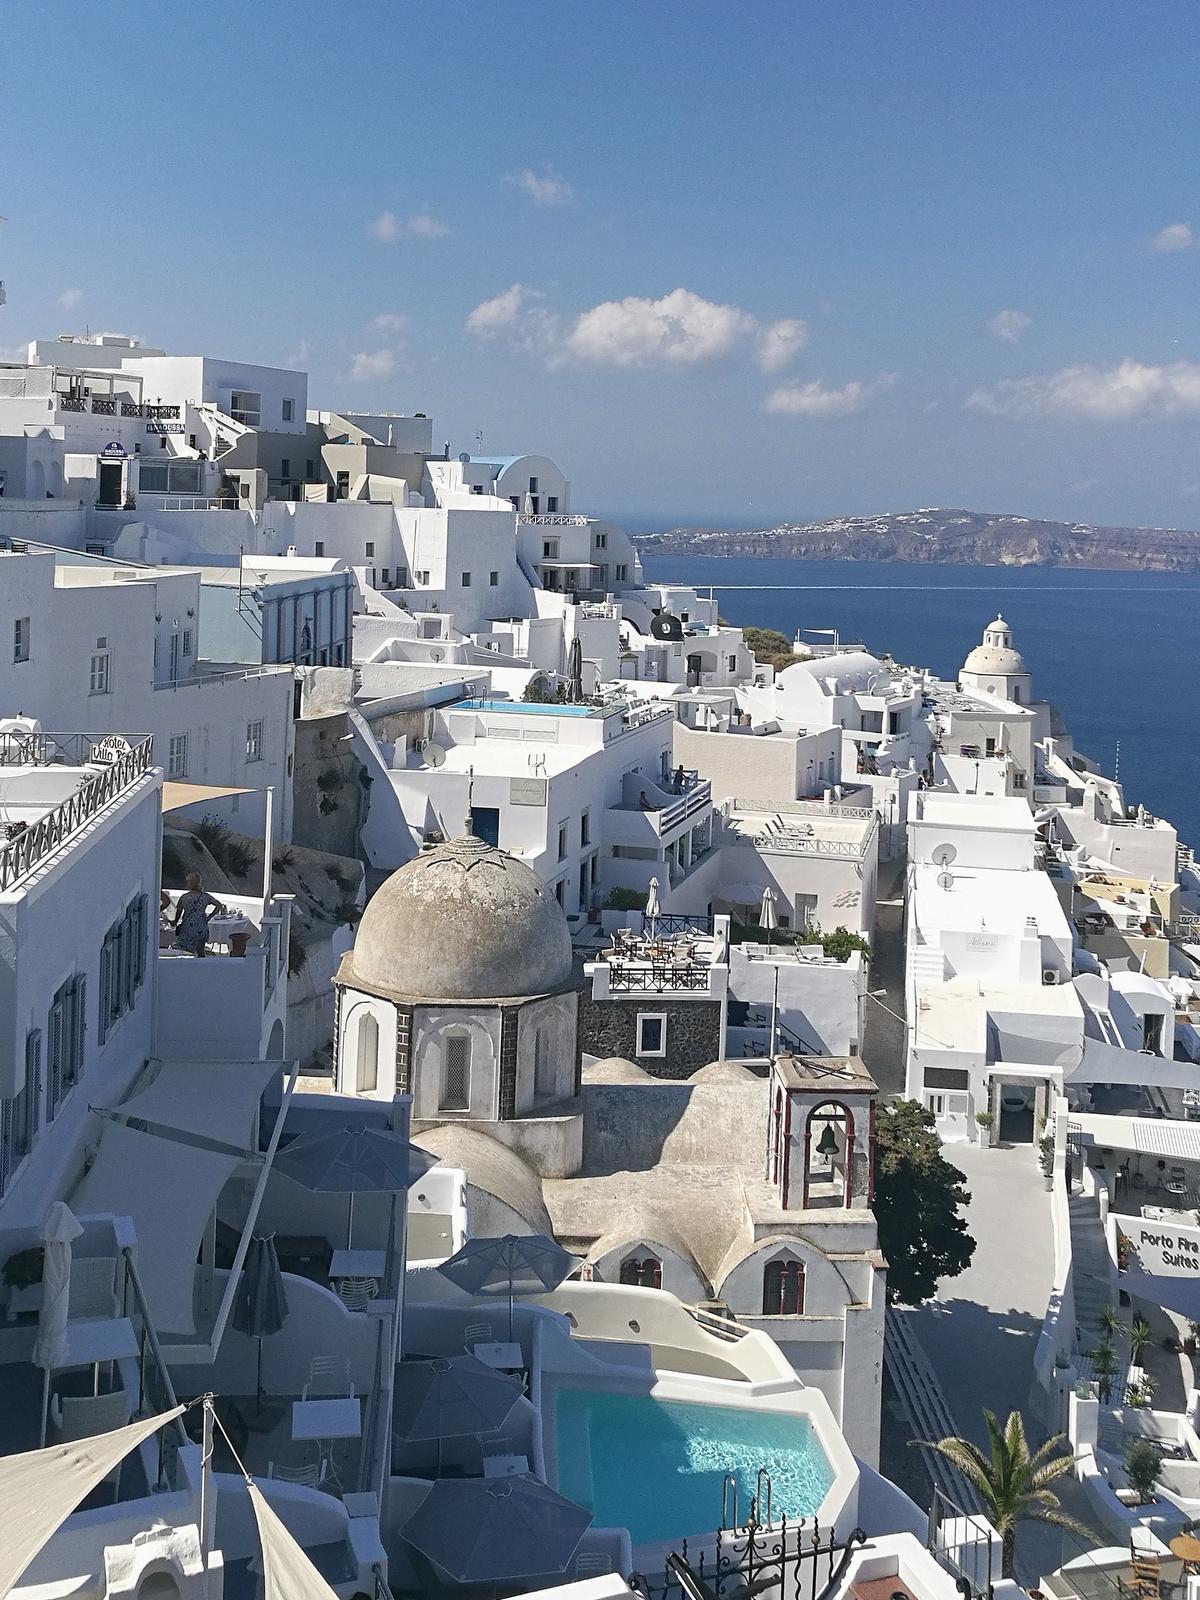 santorin - fira - thira - landscape - greece - grece - santorini - travelblog - travel - voyage